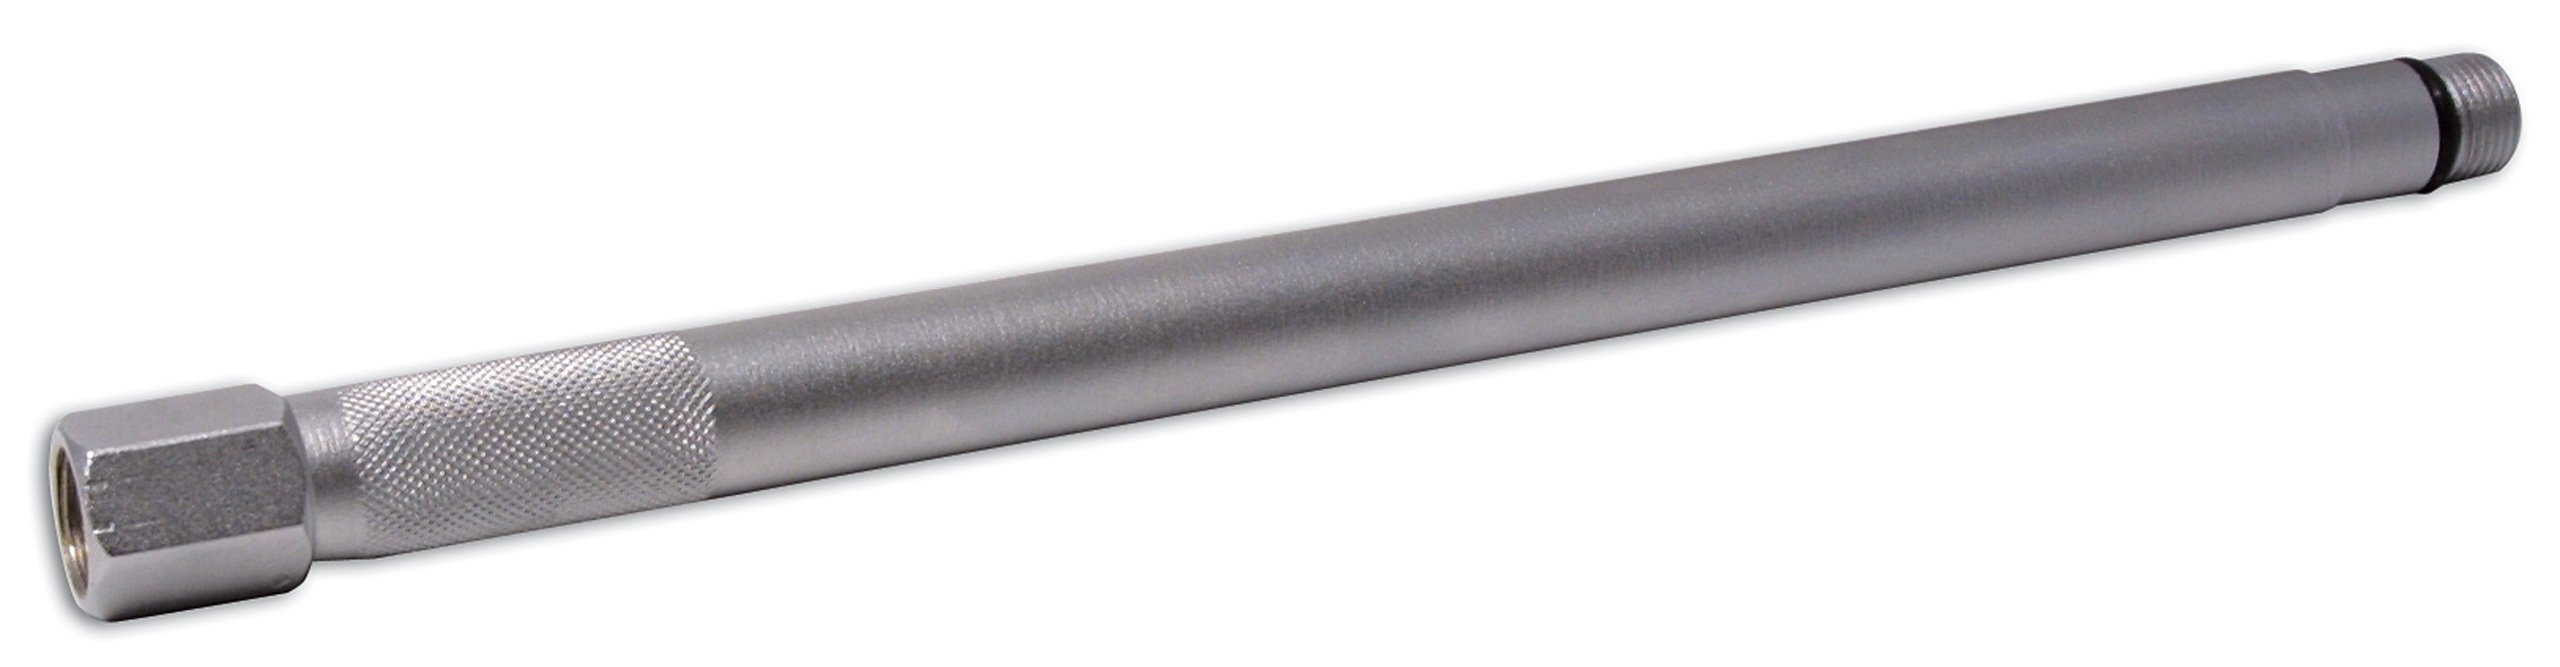 Laser - 3781 Long Reach Compression Tester Adaptor